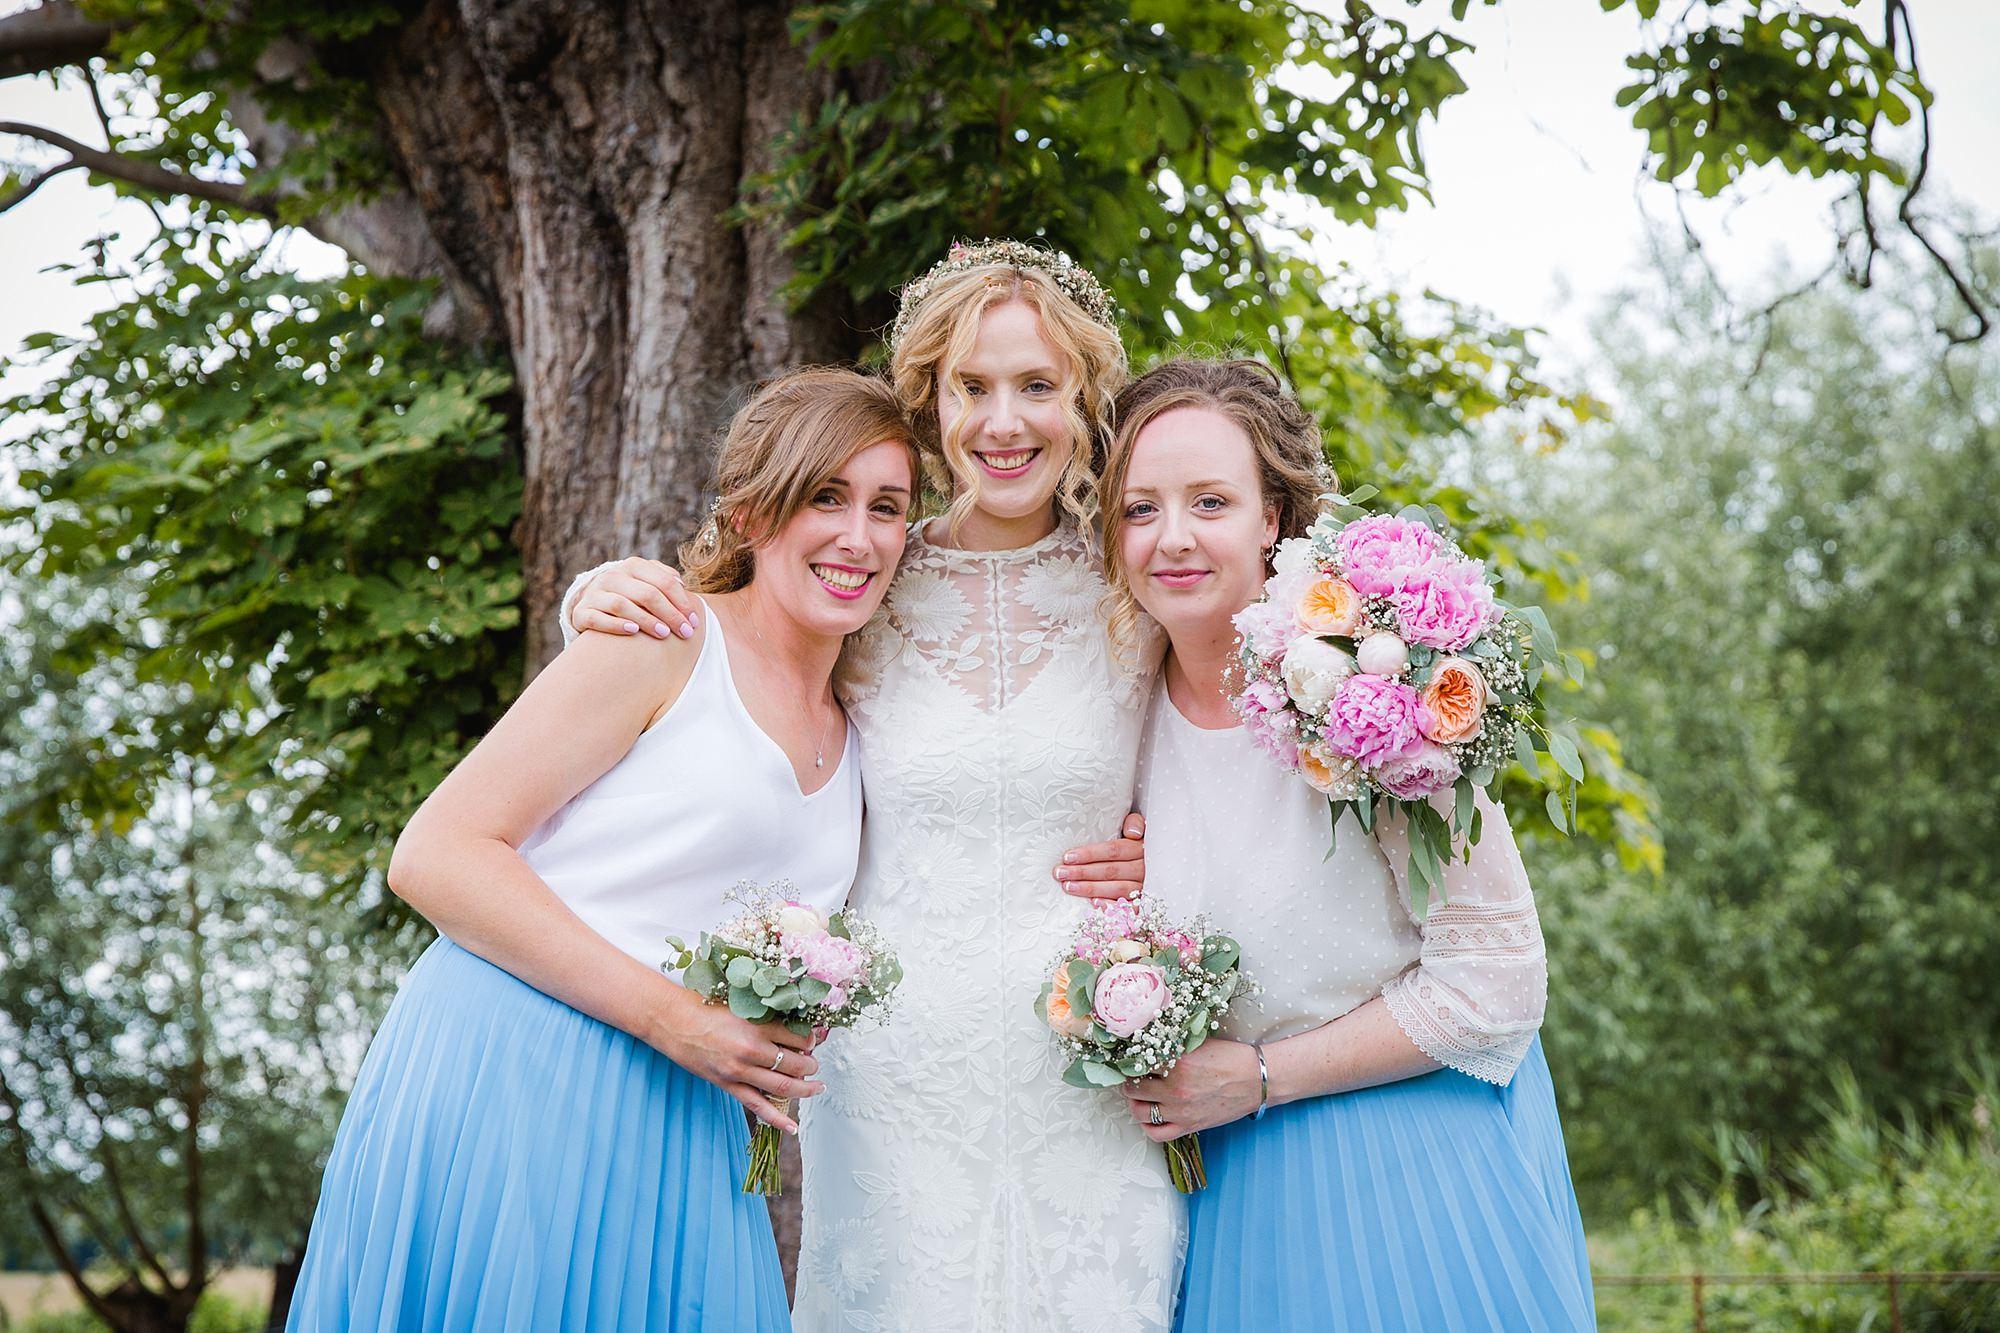 Isis Farmhouse Oxford Wedding portrait of bride with bridesmaids